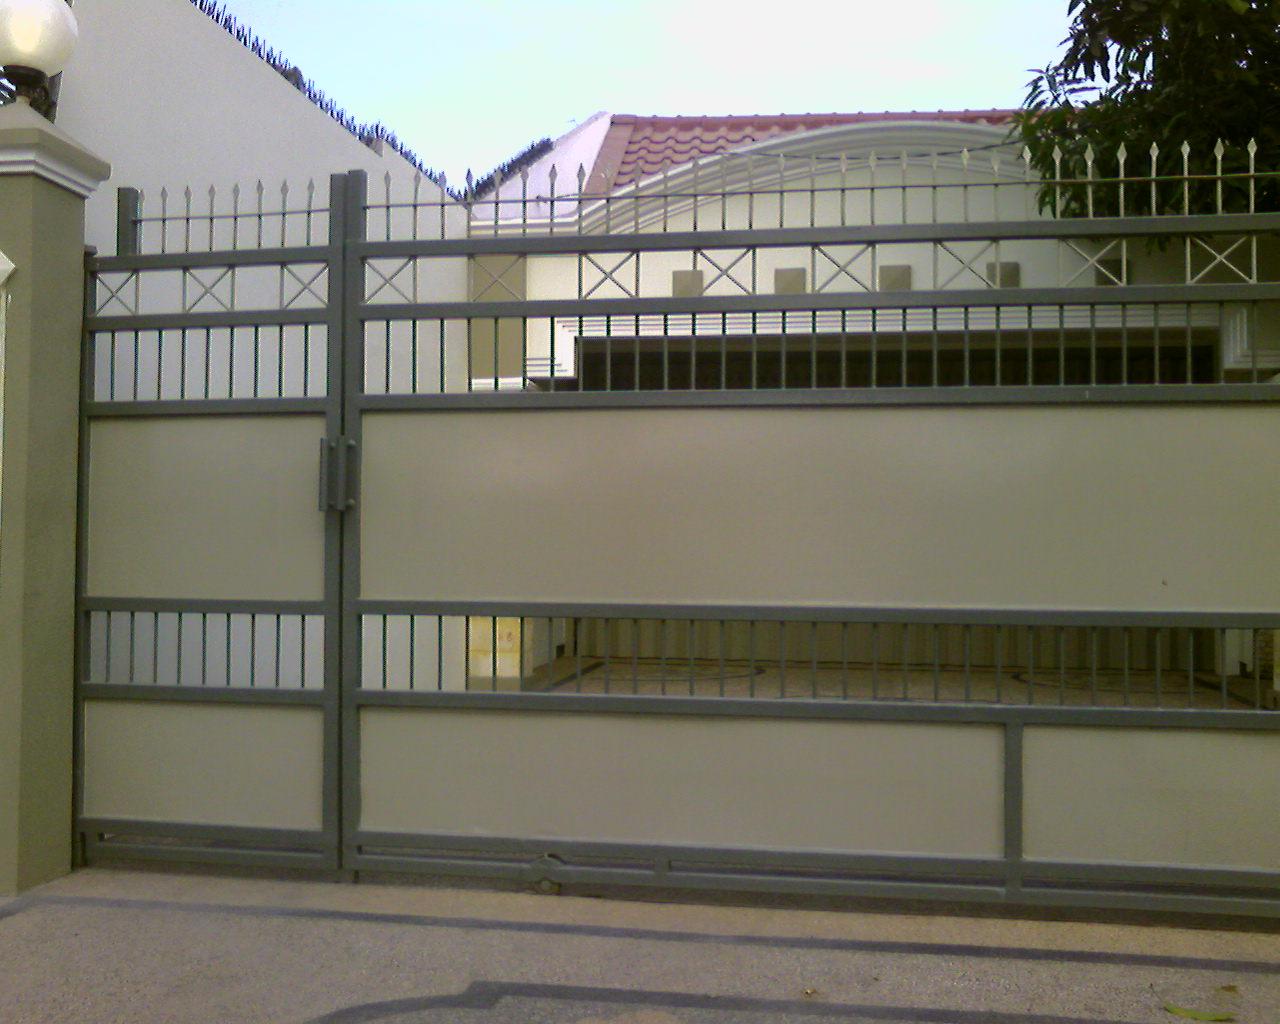 House Fence Design